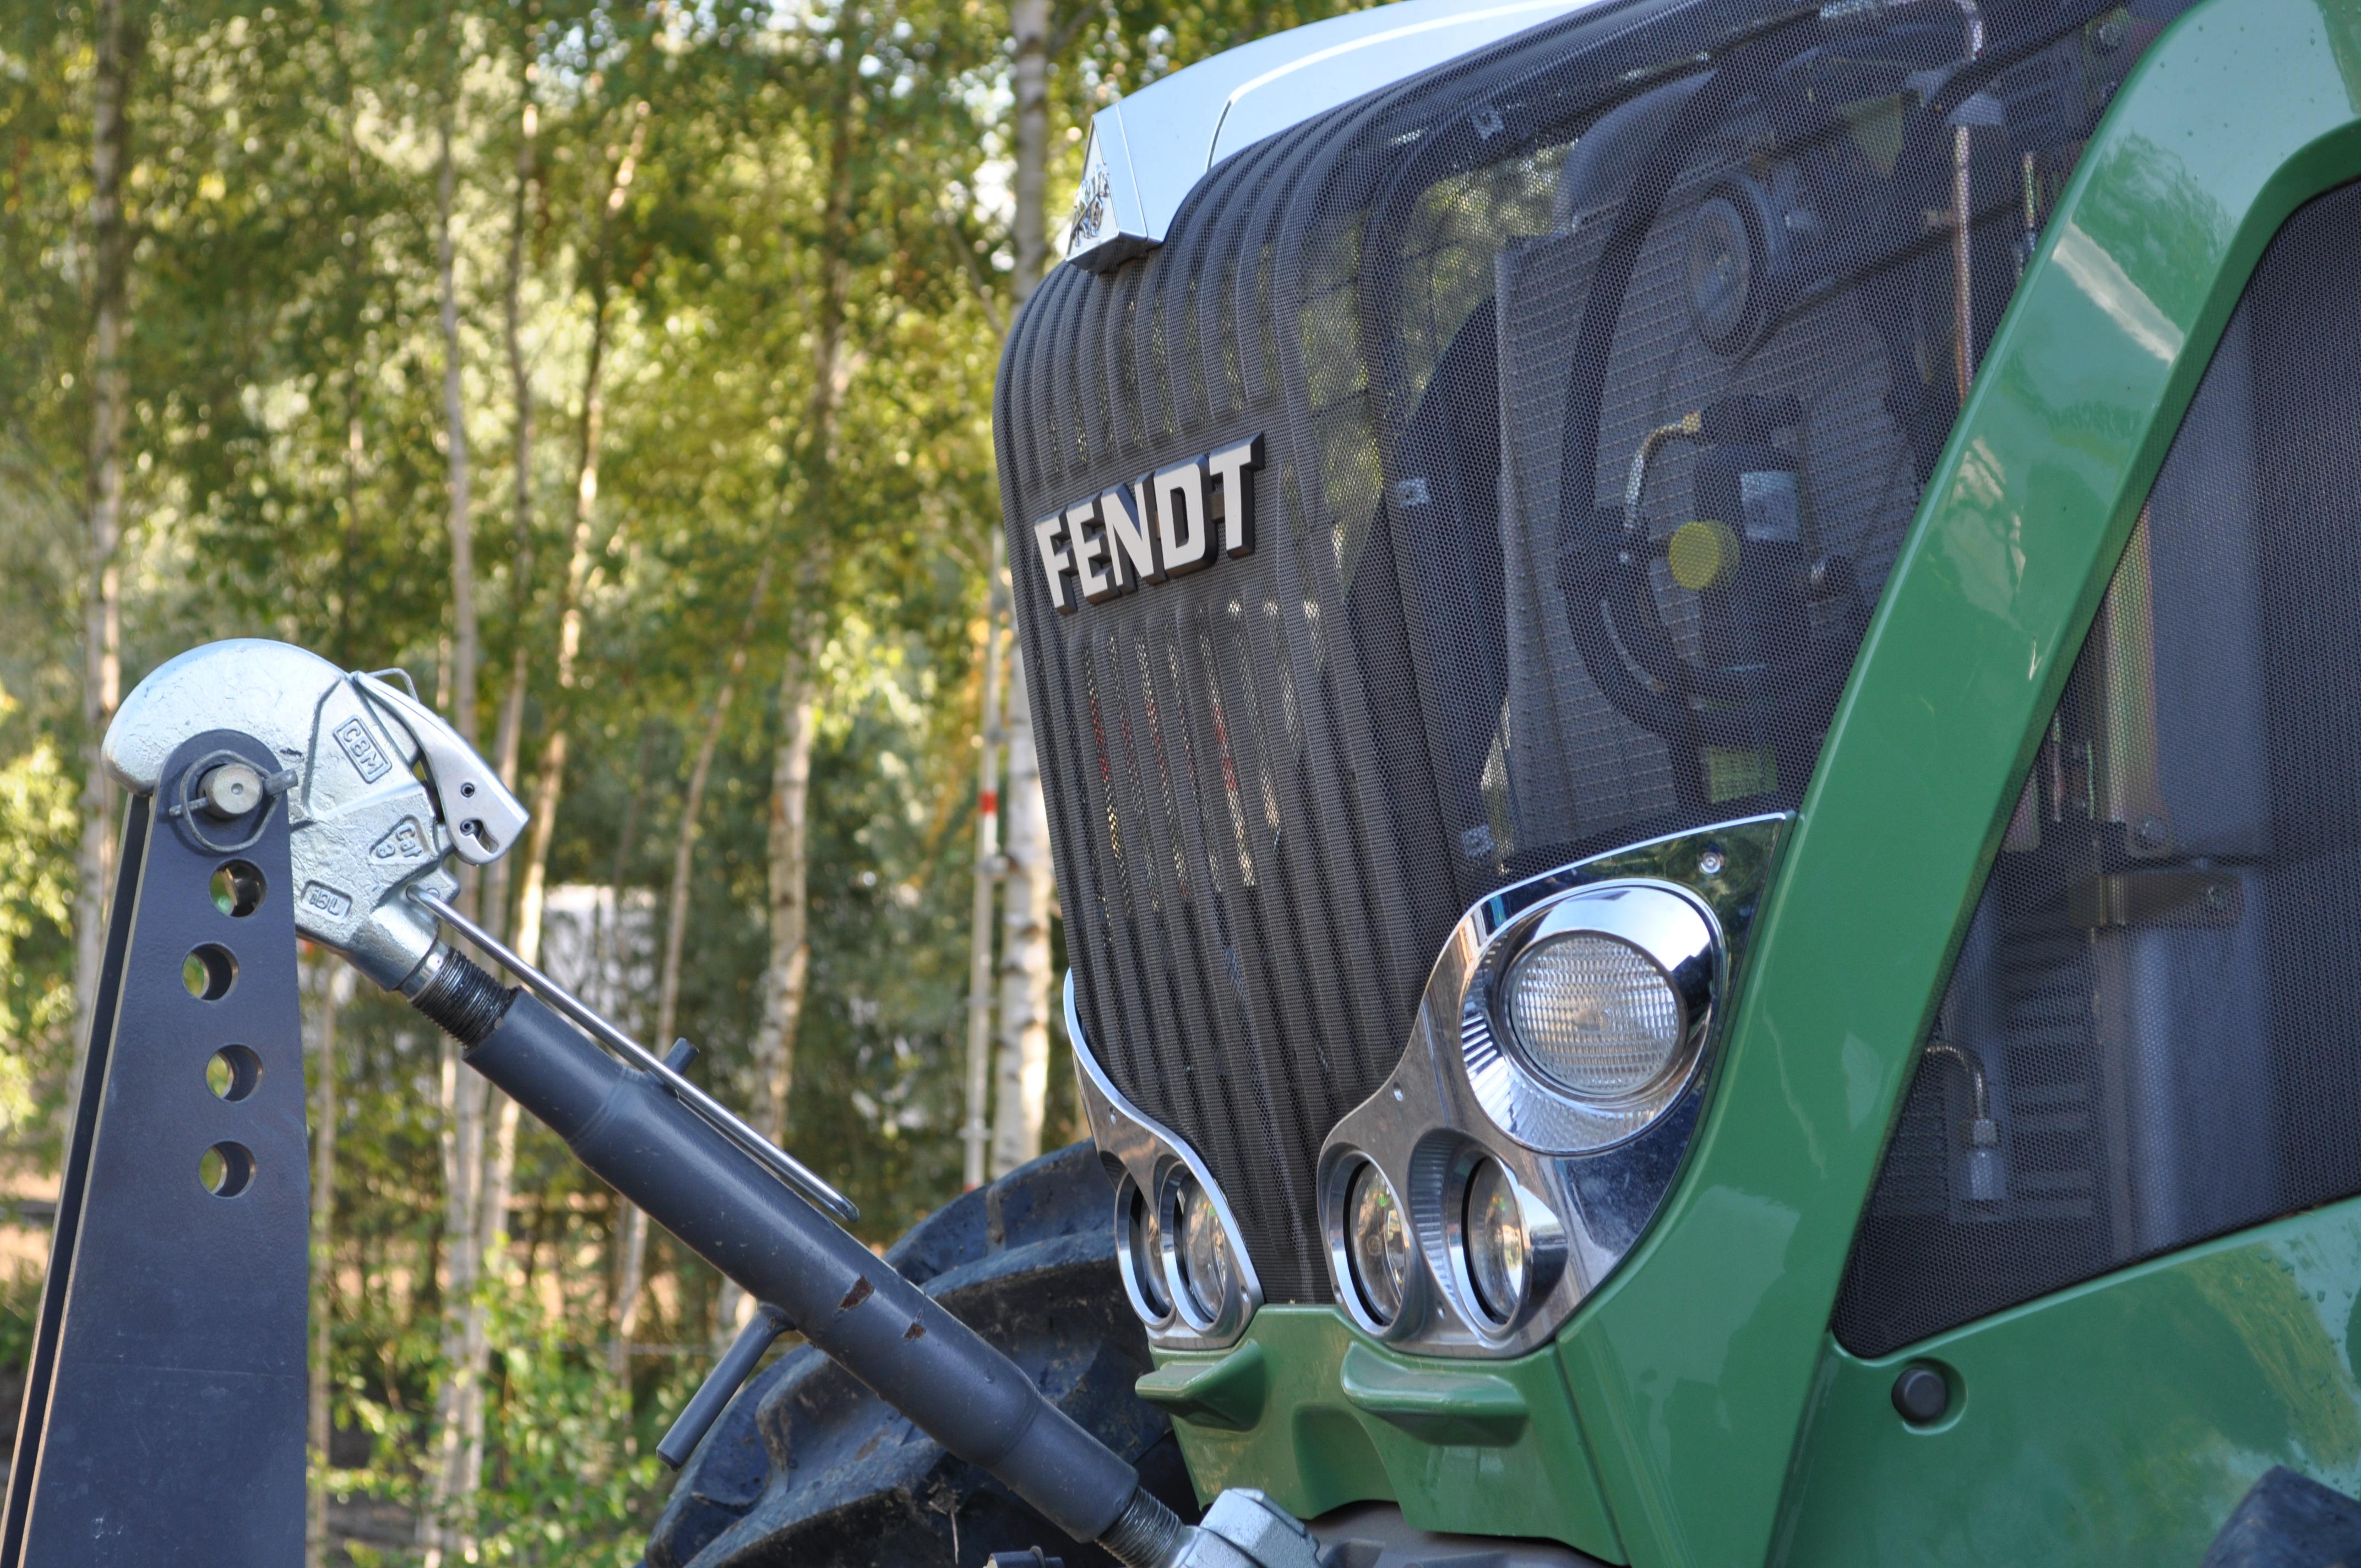 Traktoren autoscout24 deutschland Landmaschinen Traktoren